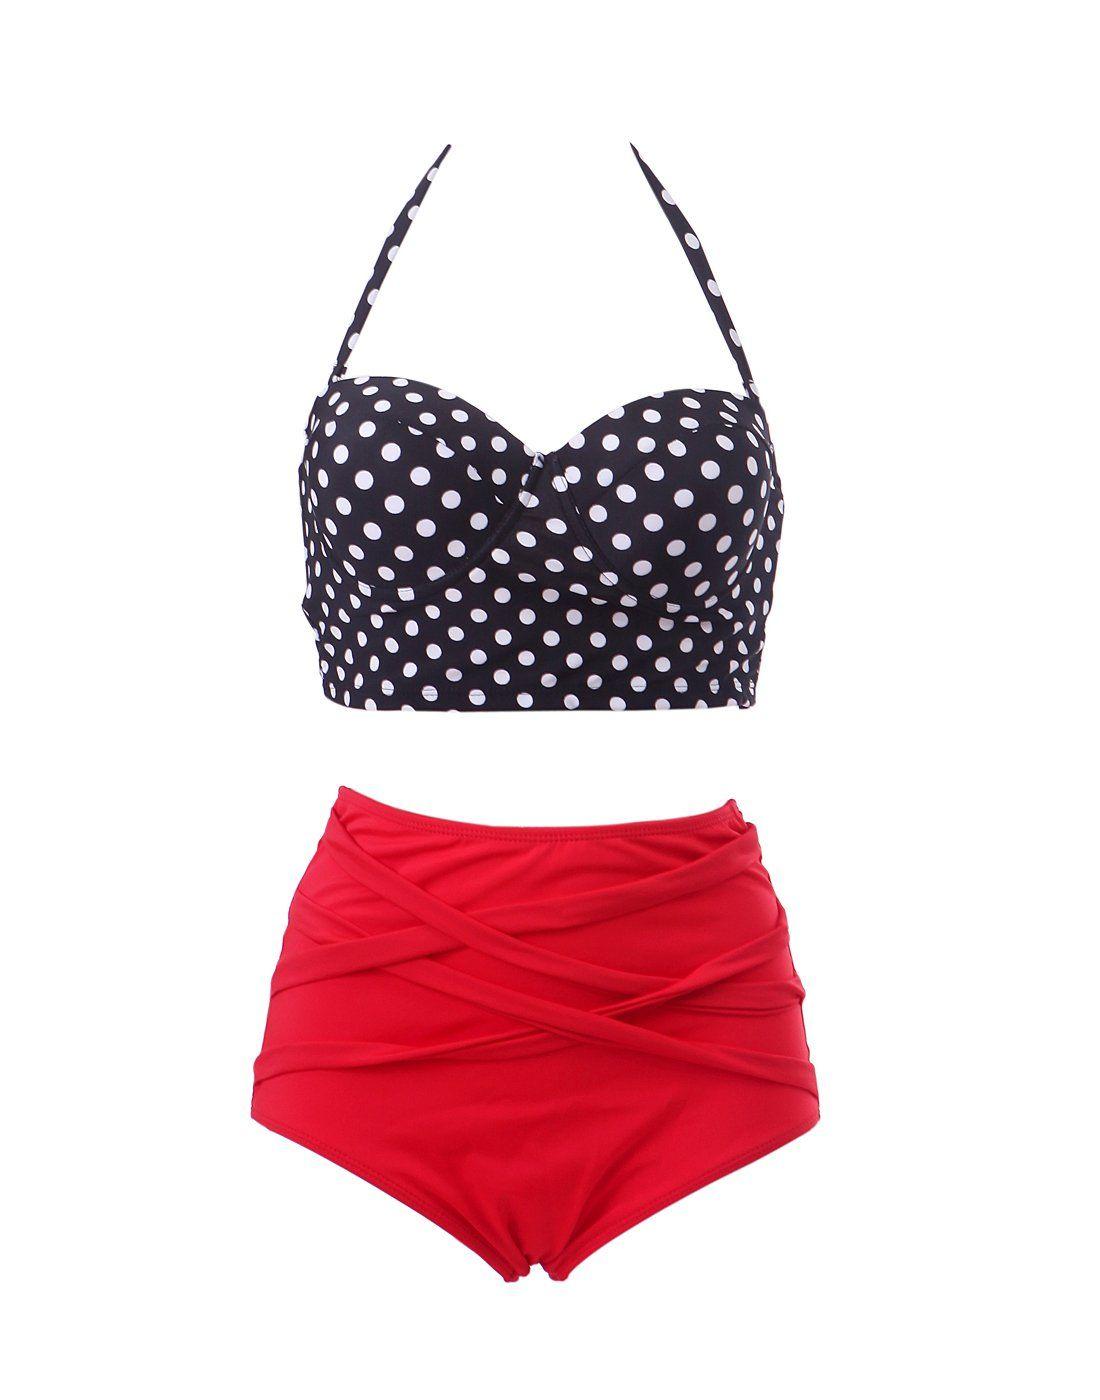 a141043b69 HDE Women Vintage 50s Pinup Girl Rockabilly High Waist Retro Bikini Swimsuit  Set (Polka Dot Bustier with Red Bottom, Large)